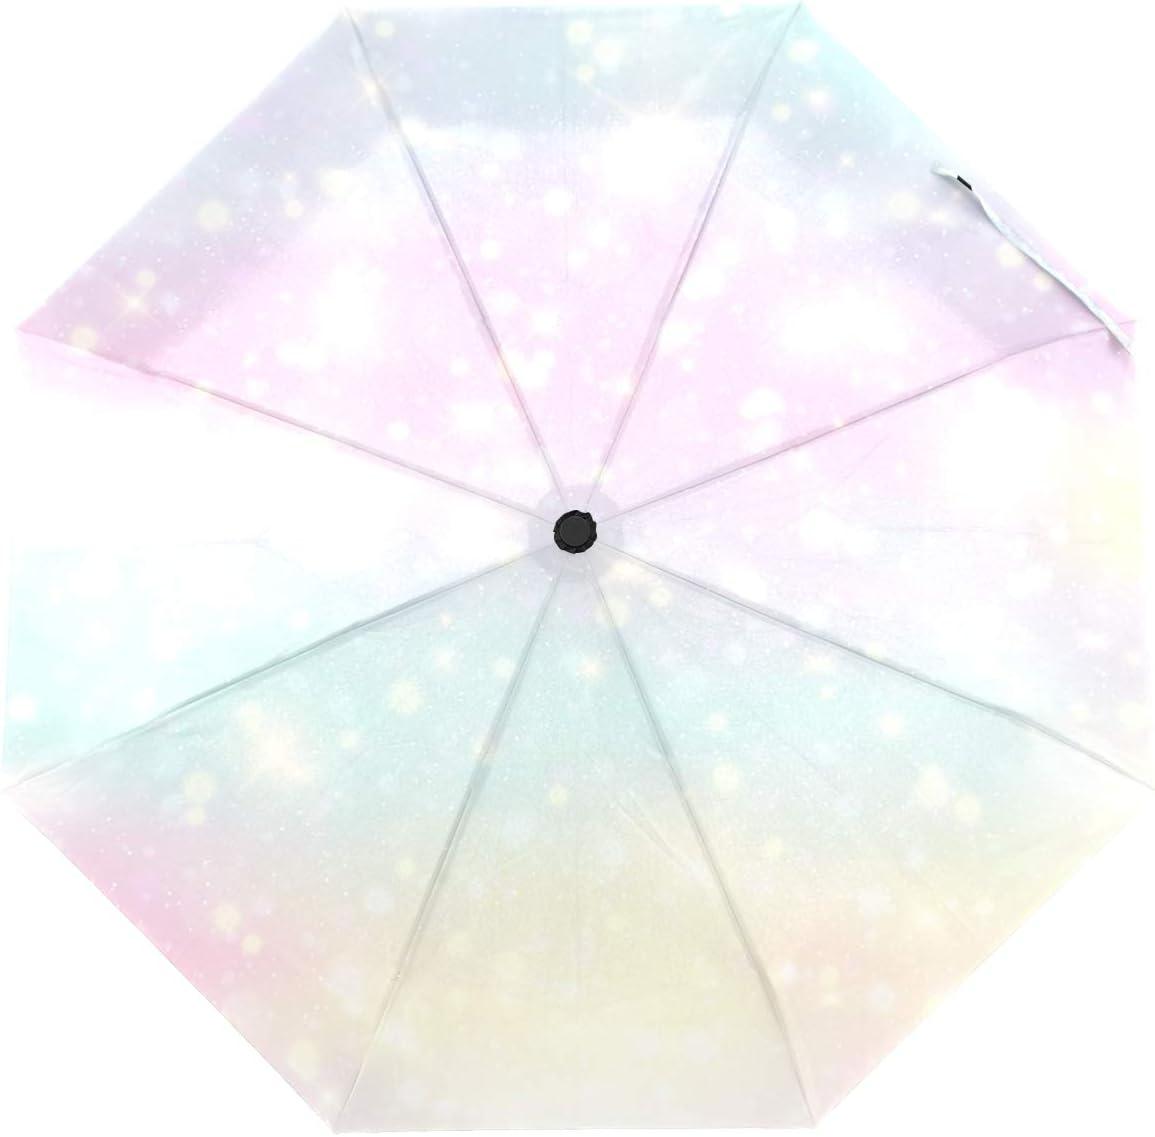 OREZI Automatic Open Close Folding Galaxy Umbrella Fantasy Backg 35% OFF Limited price sale